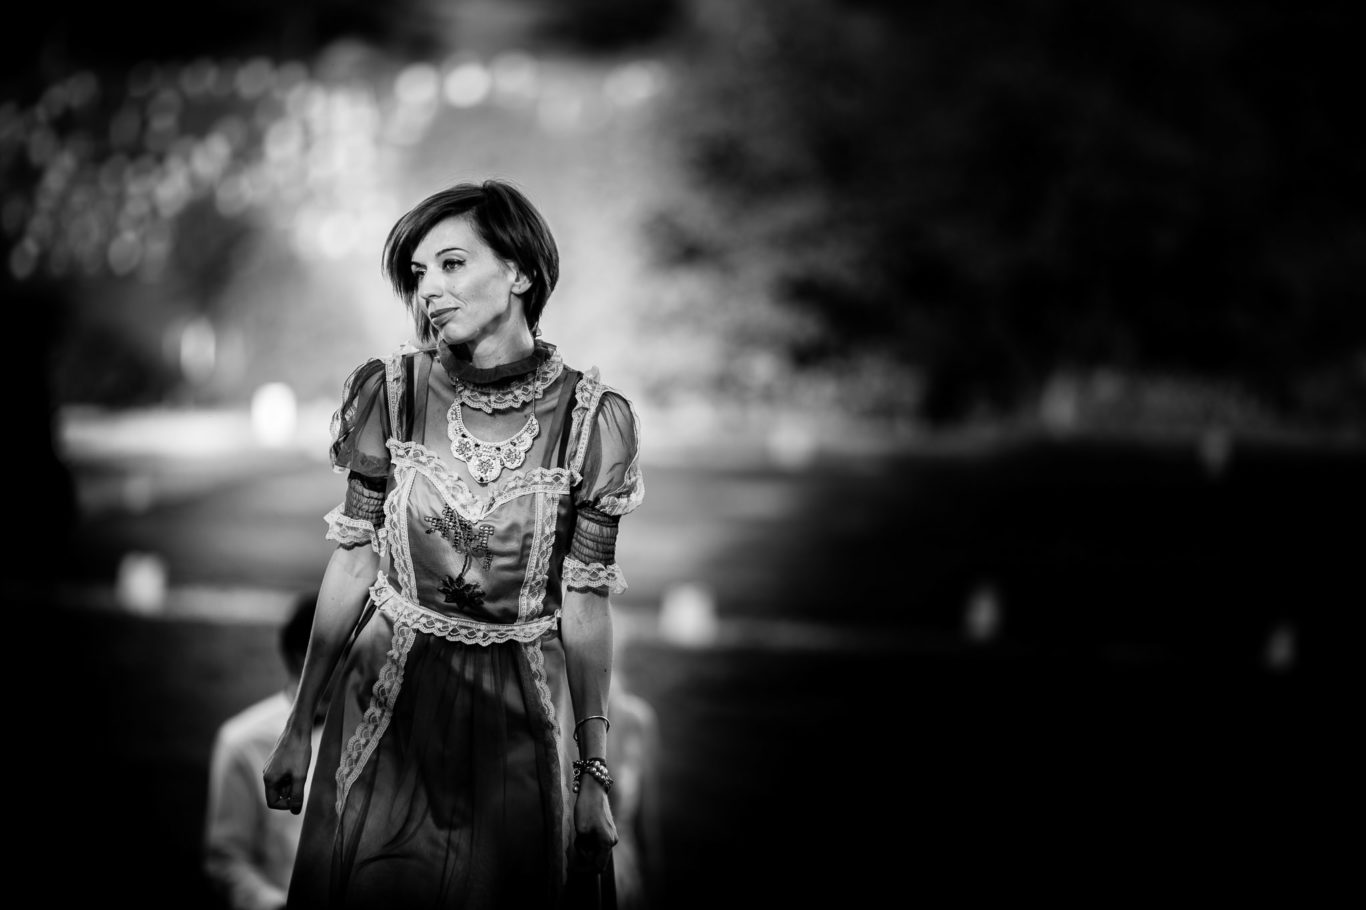 0512-fotografie-nunta-conacul-apafi-ana-simion-fotograf-ciprian-dumitrescu-cd2_0894